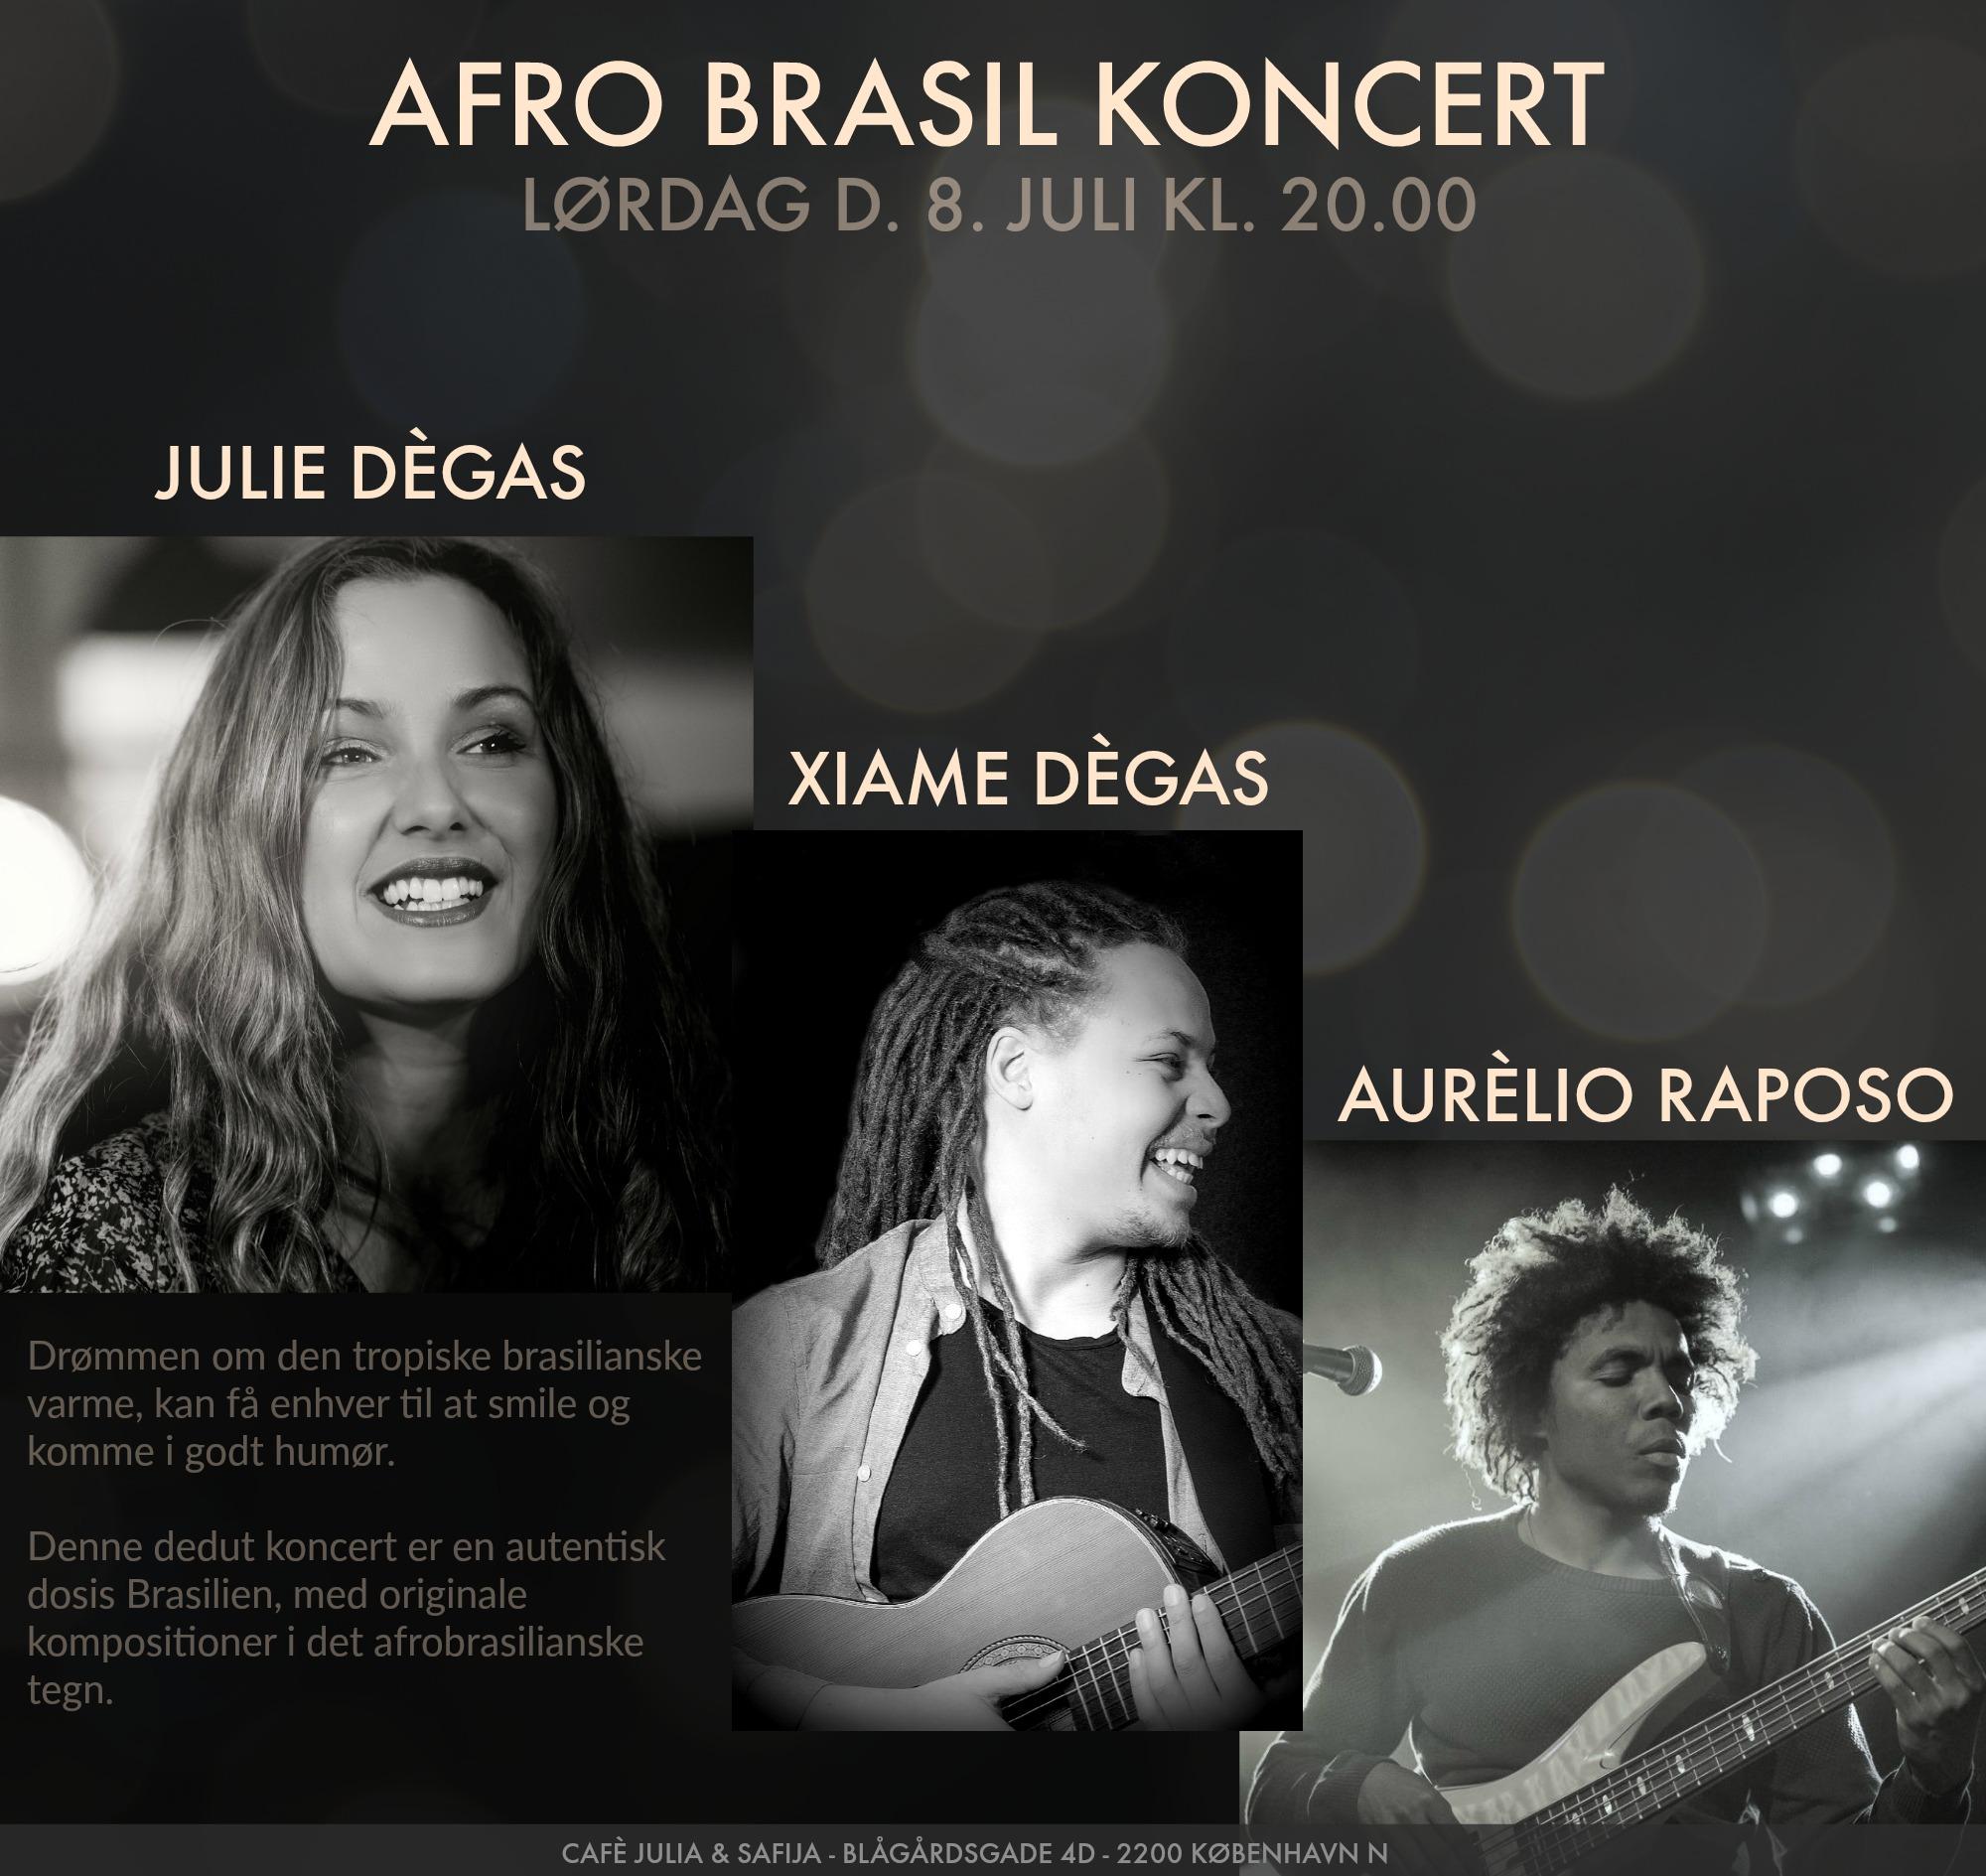 AFRO BRASIL KONCERT - FEAT. AURÈLIO